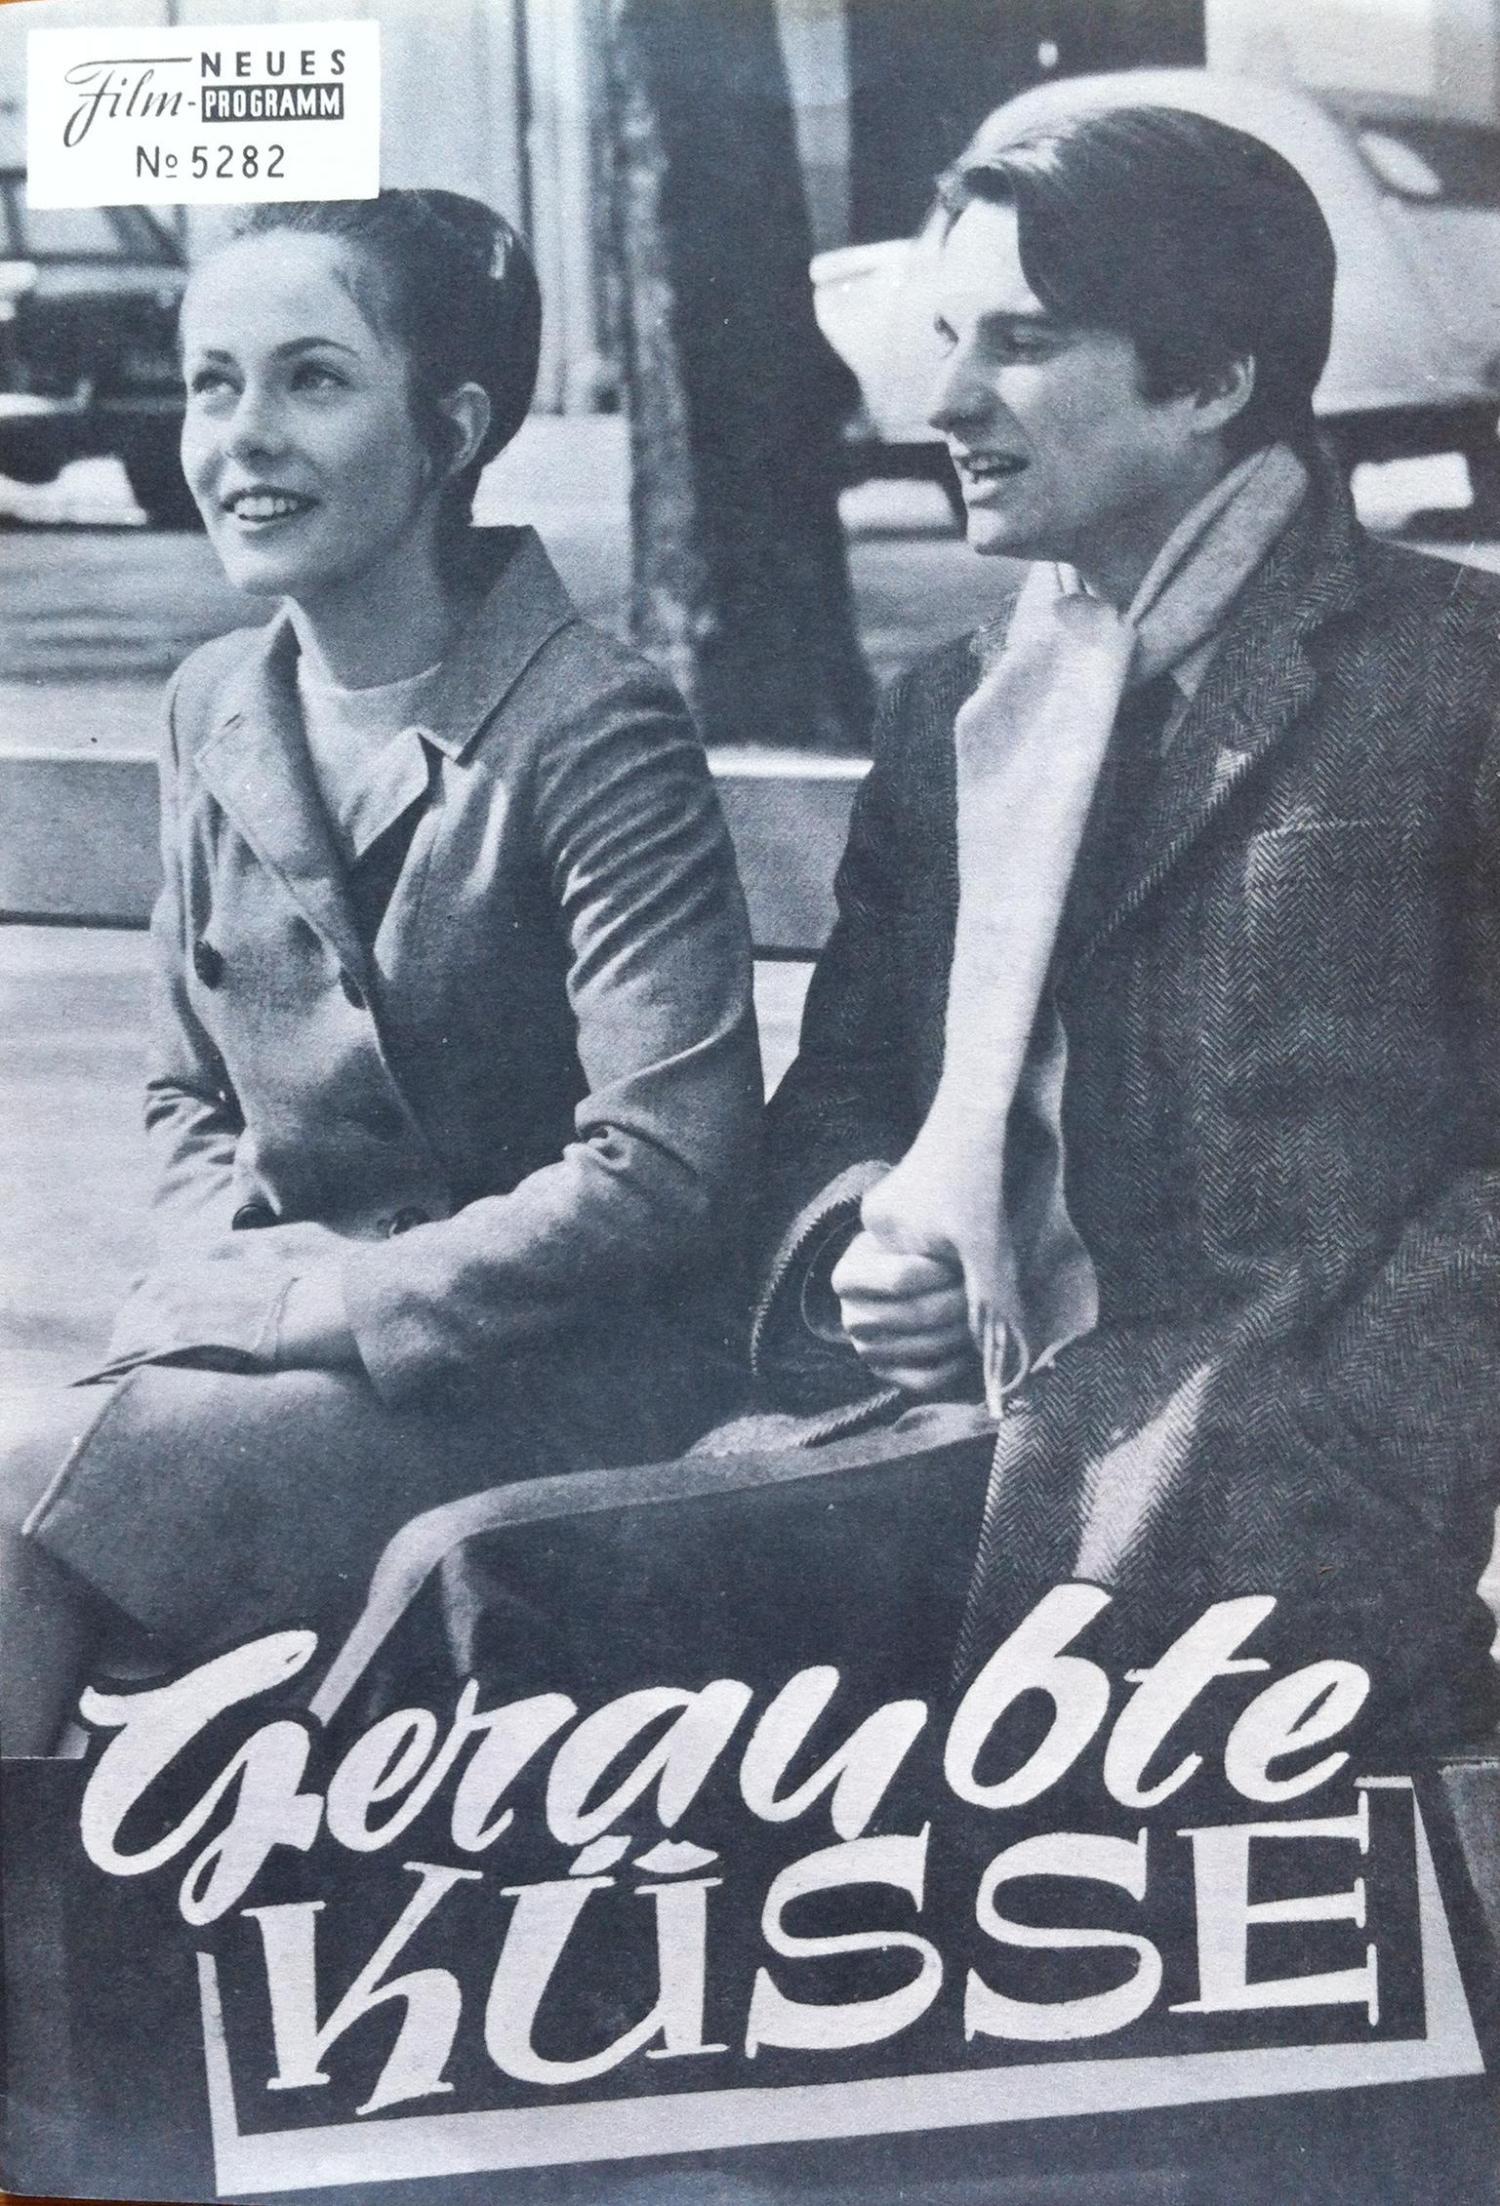 filmprogramm_geraubte_kuesse_1968_Baisers_voles_Francois_Truffaut_Claude_Jade_Jean-Pierre_Leaud